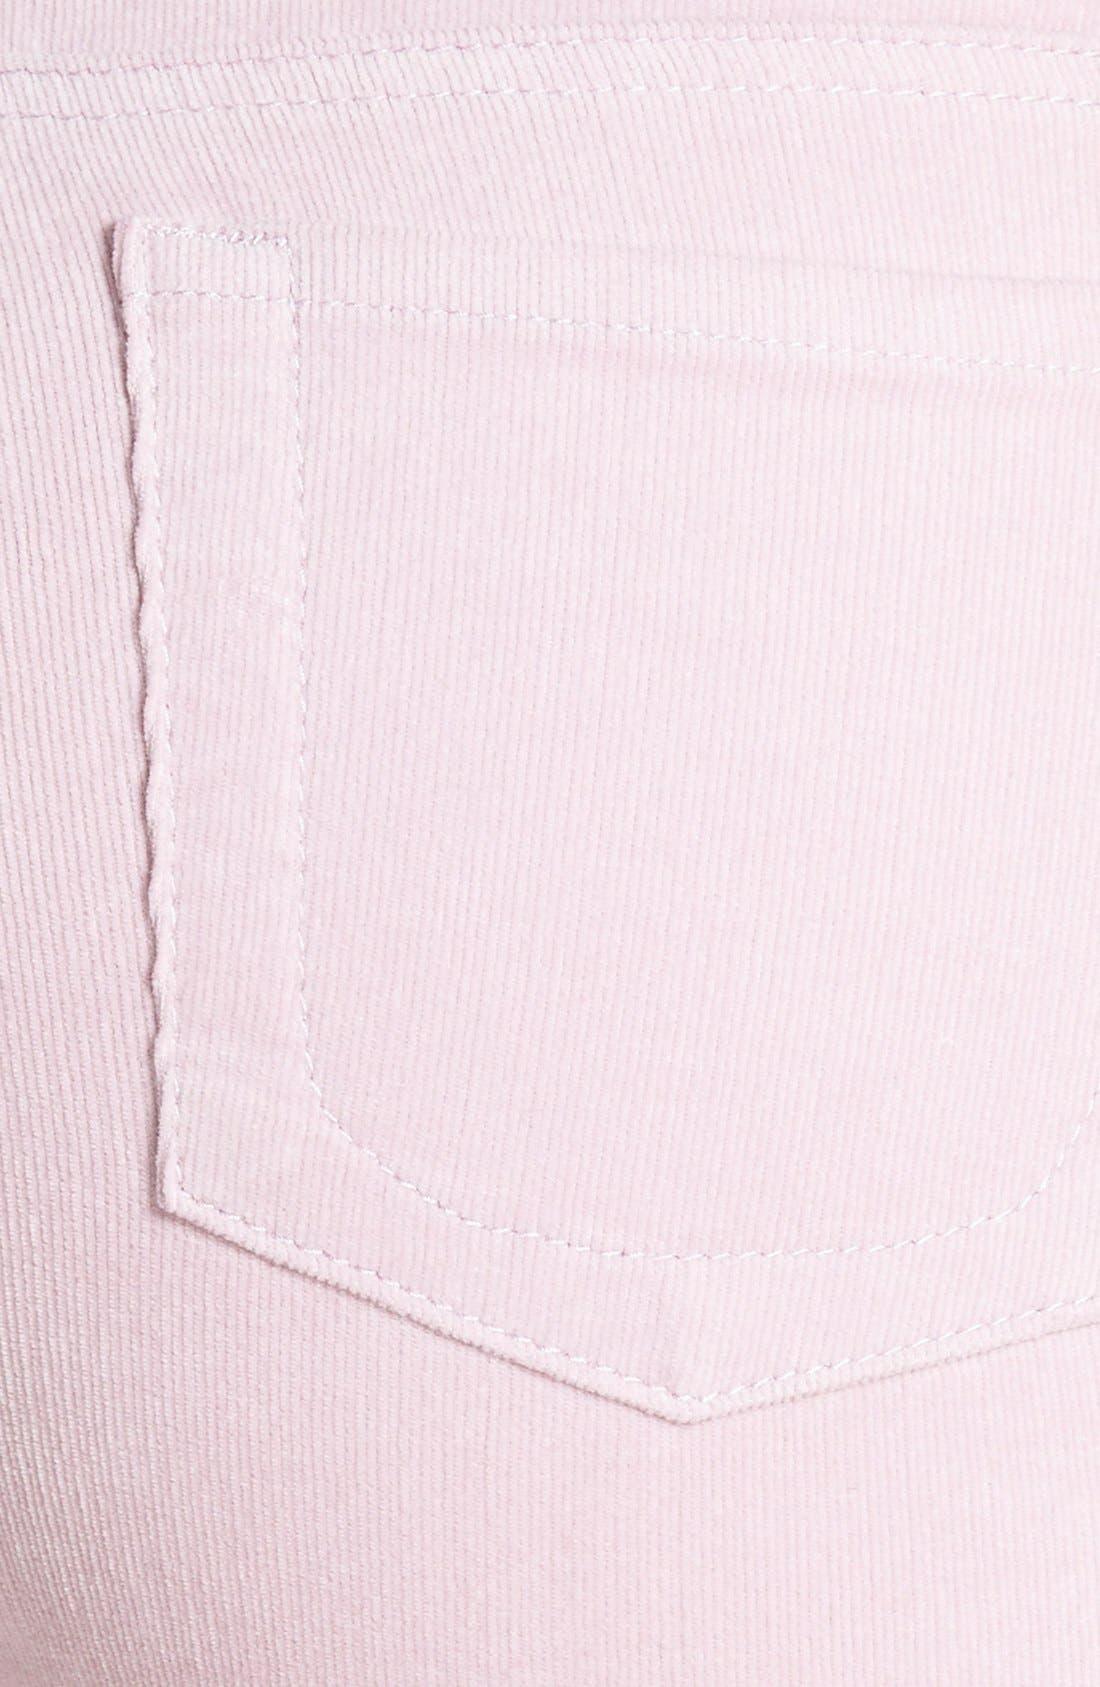 'Diana' Stretch Corduroy Skinny Pants,                             Alternate thumbnail 98, color,